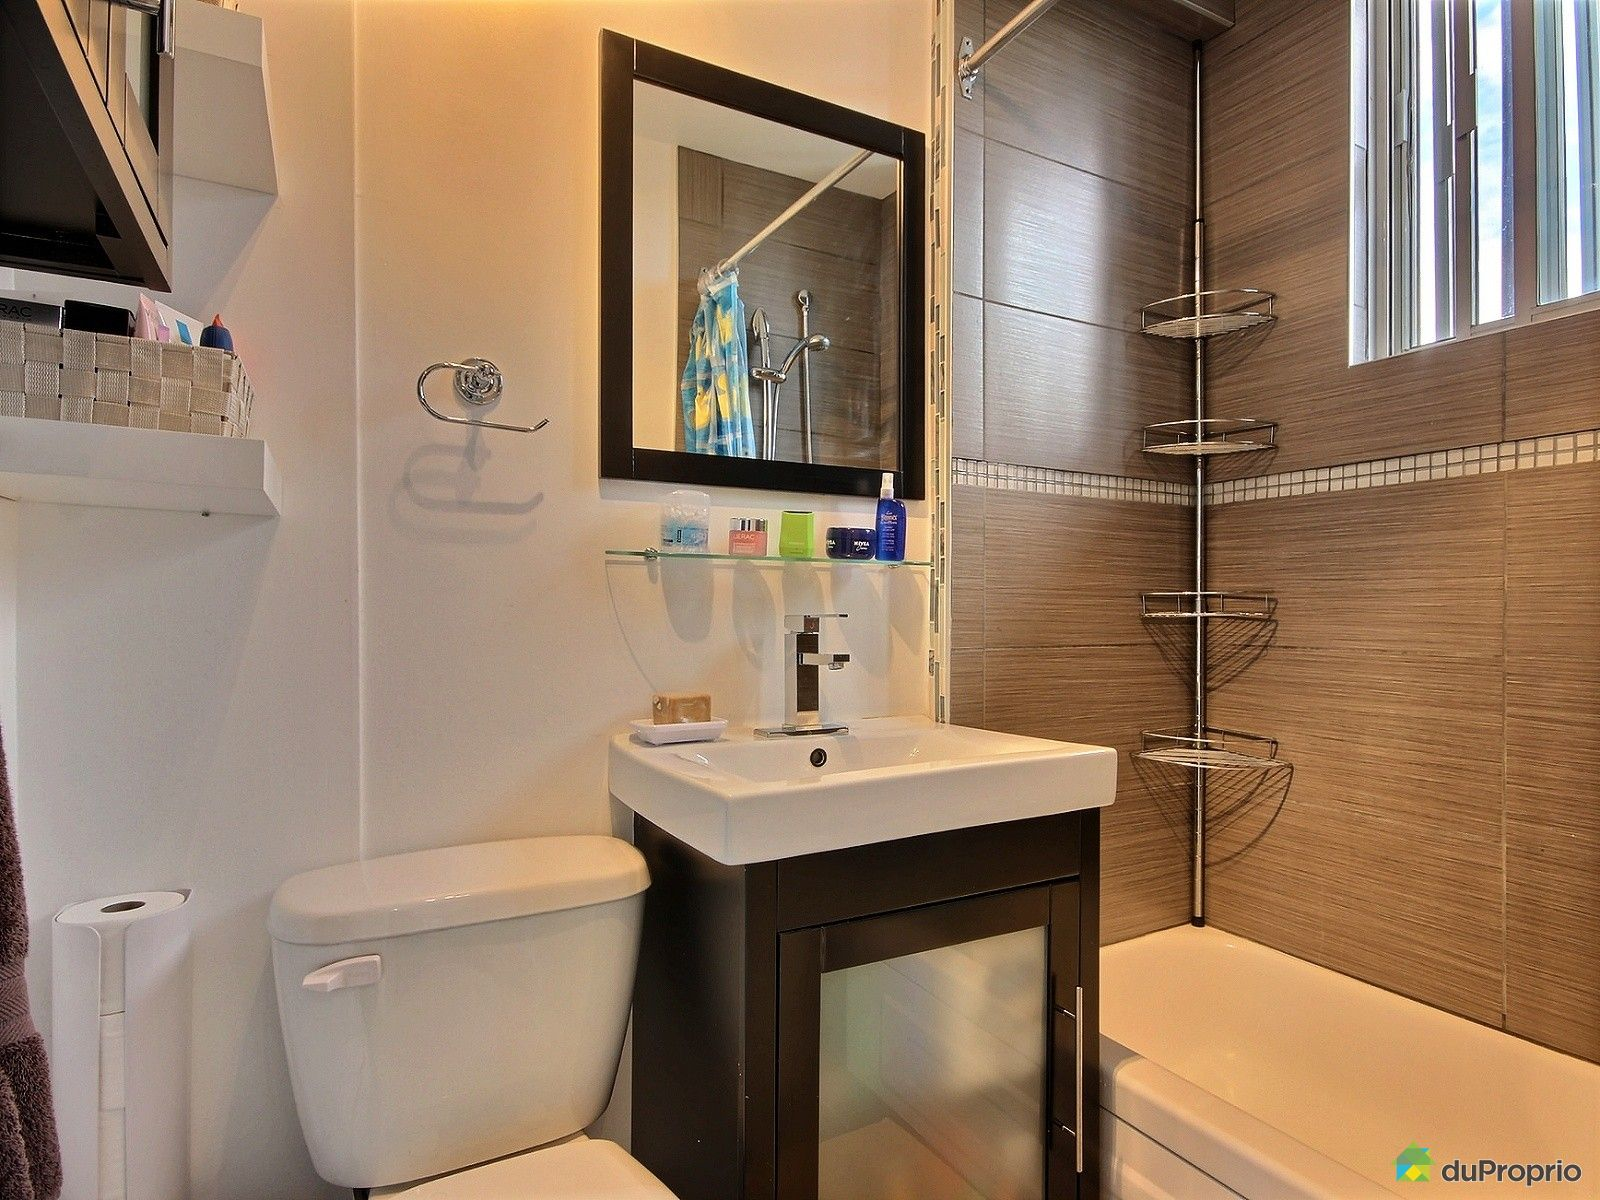 condo vendre montr al 1805 rue saint germain immobilier qu bec duproprio 682030. Black Bedroom Furniture Sets. Home Design Ideas